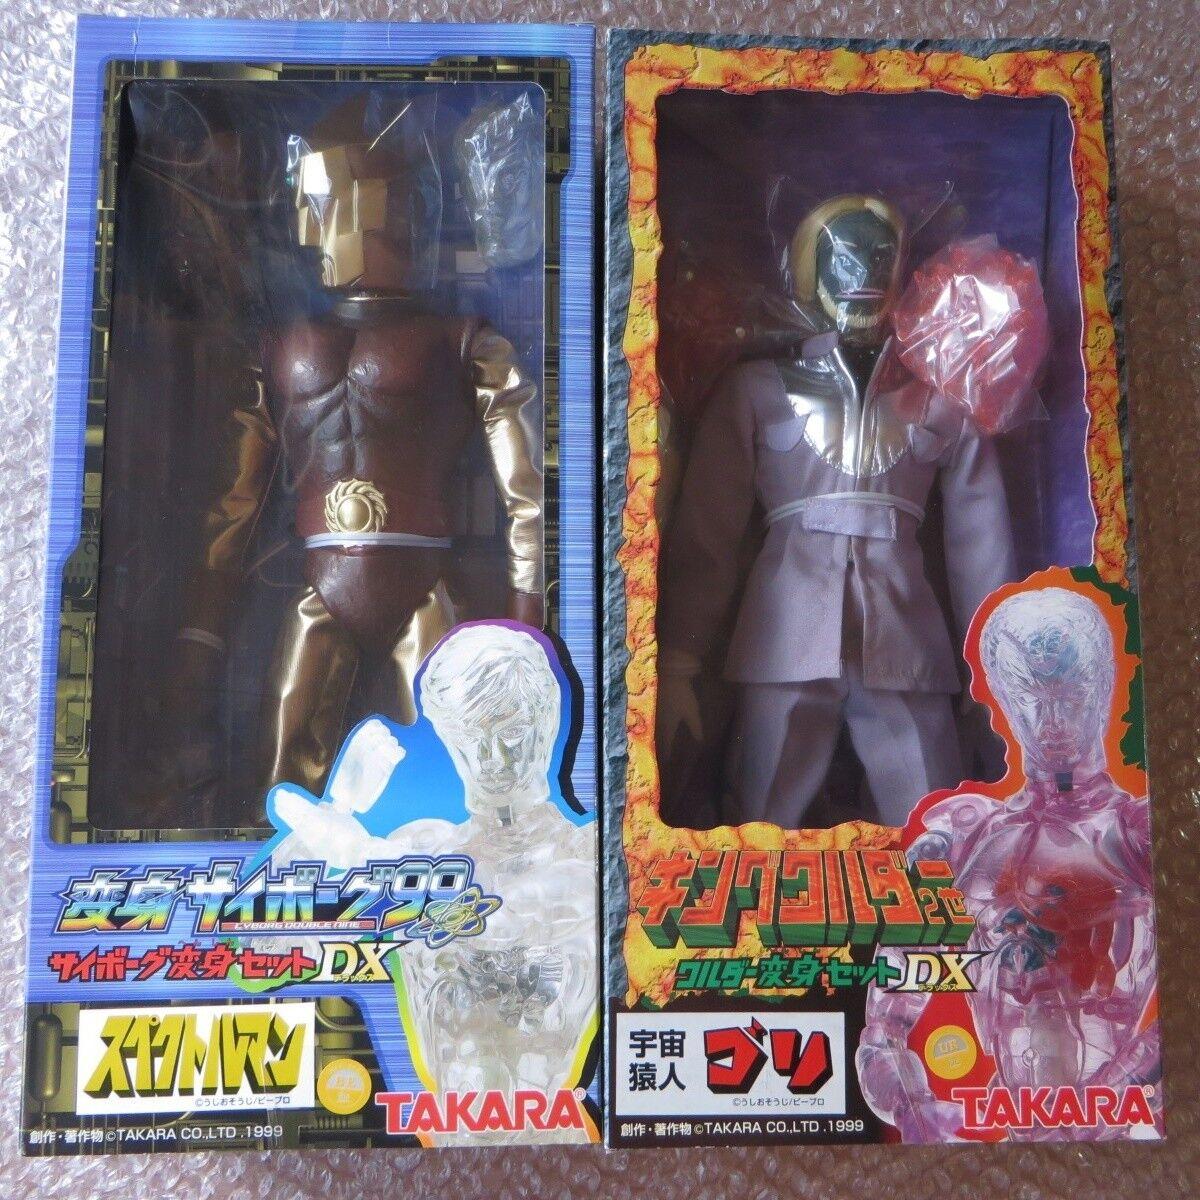 TAKARA Henshin Cyborg 99 Spectleman King Walder II Set DX Figure Toy Vintage A11